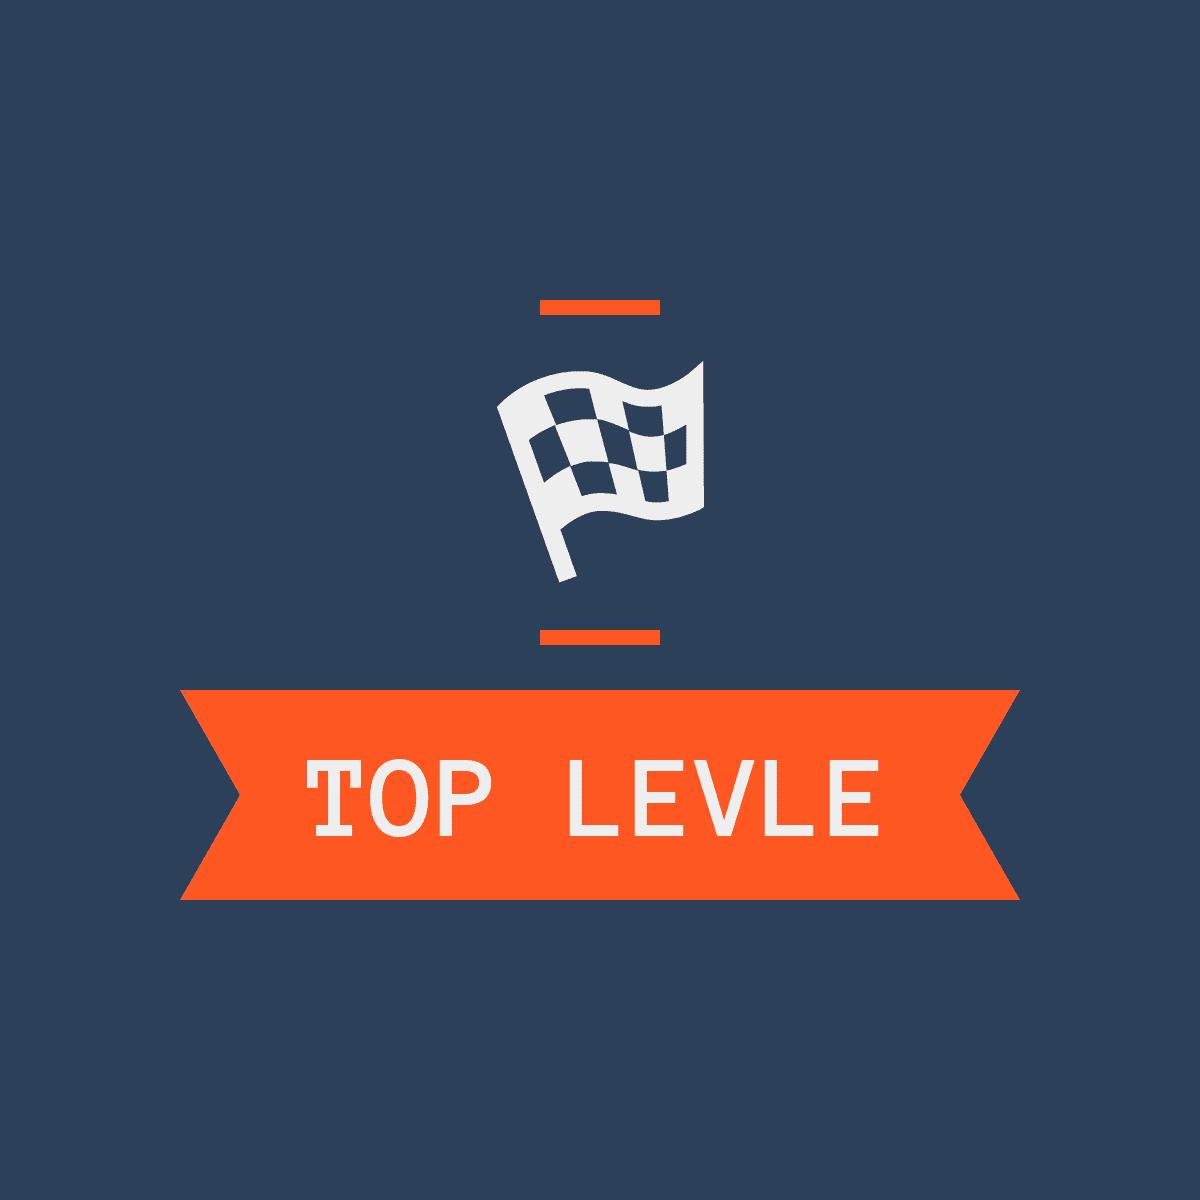 Разработка логотипа для тюнинг ателье фото f_5375f3fd014521bc.png